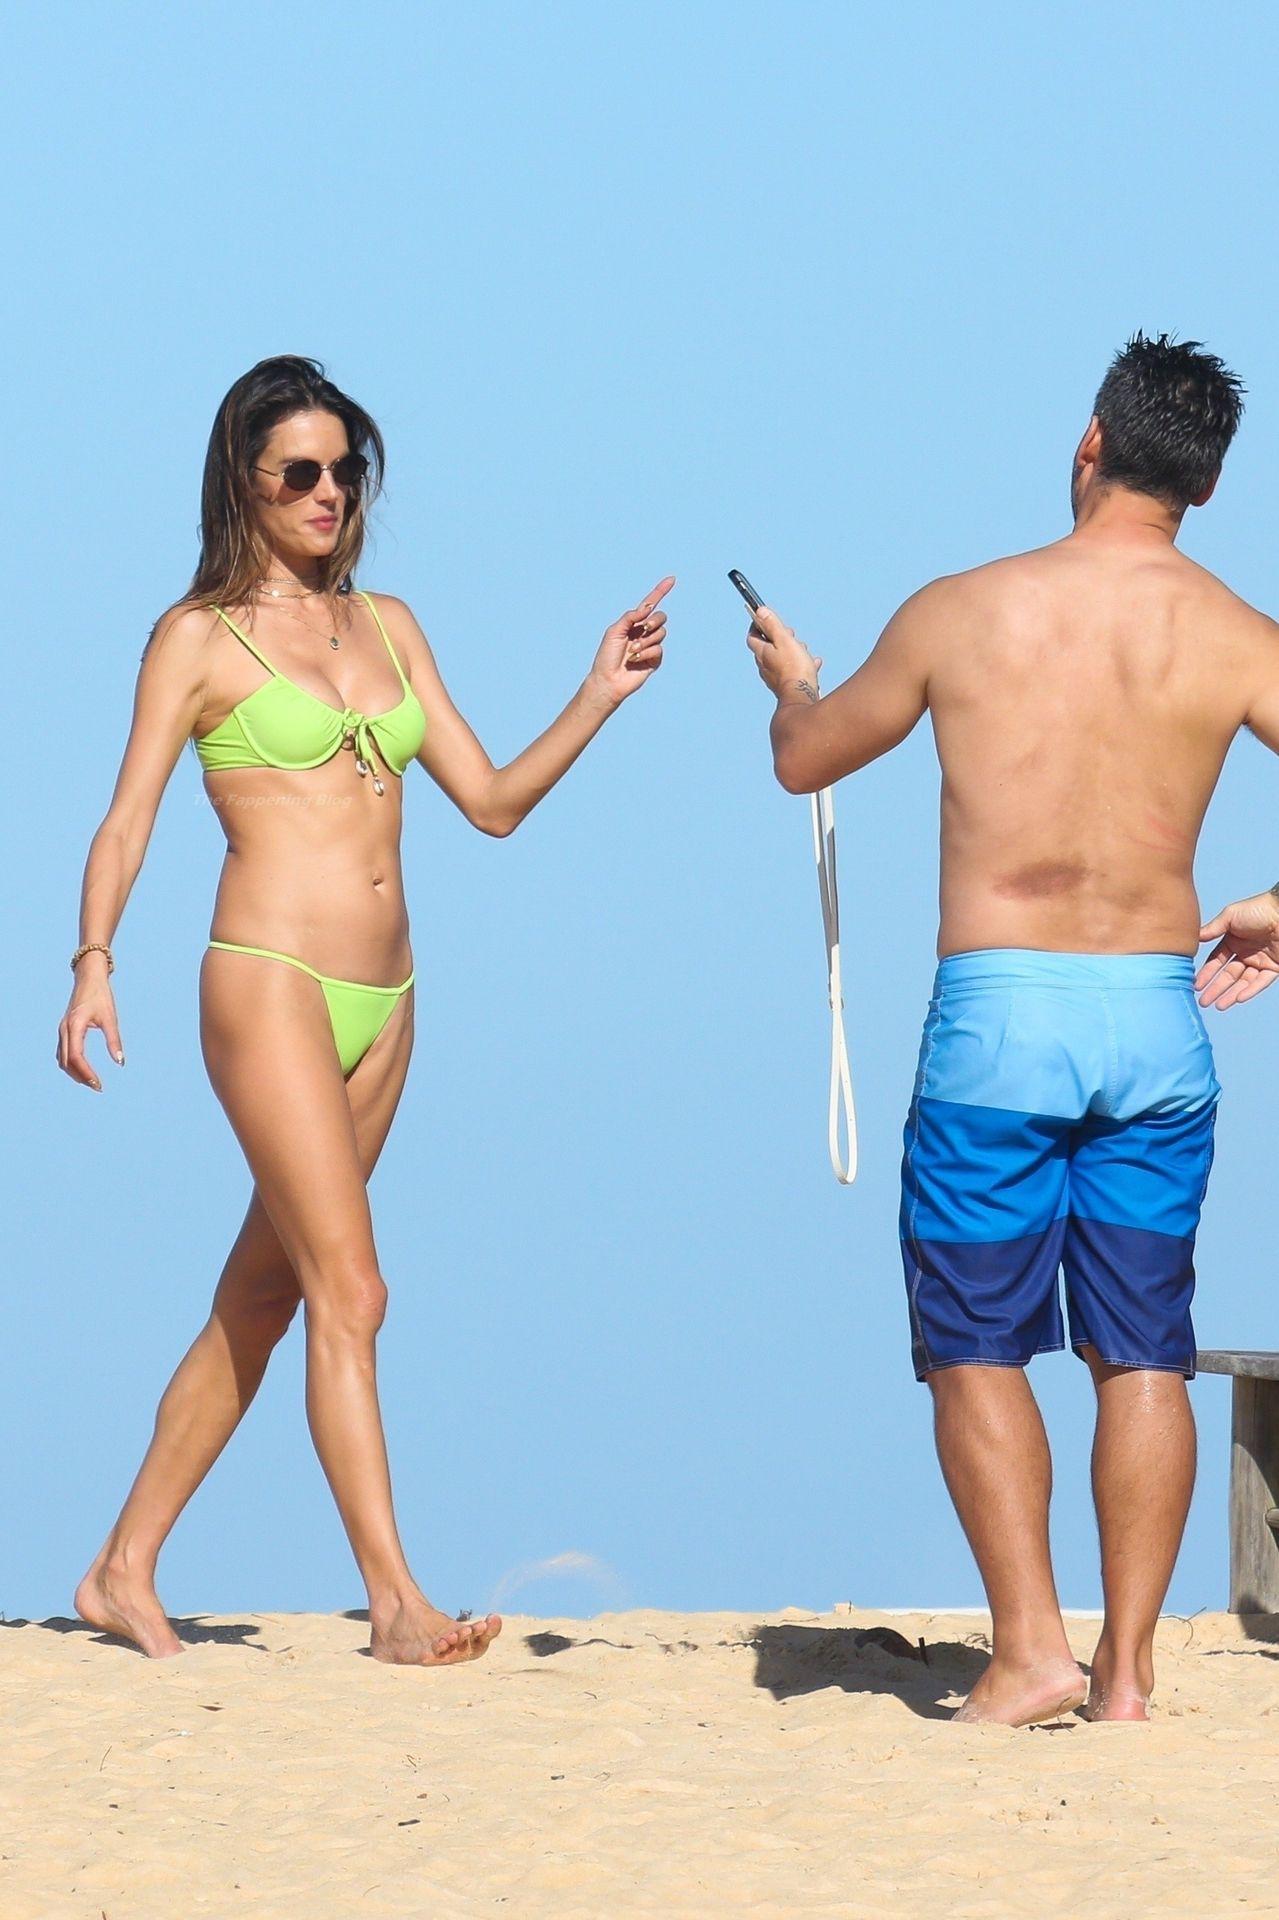 Alessandra-Ambrosio-Sexy-The-Fappening-Blog-841.jpg